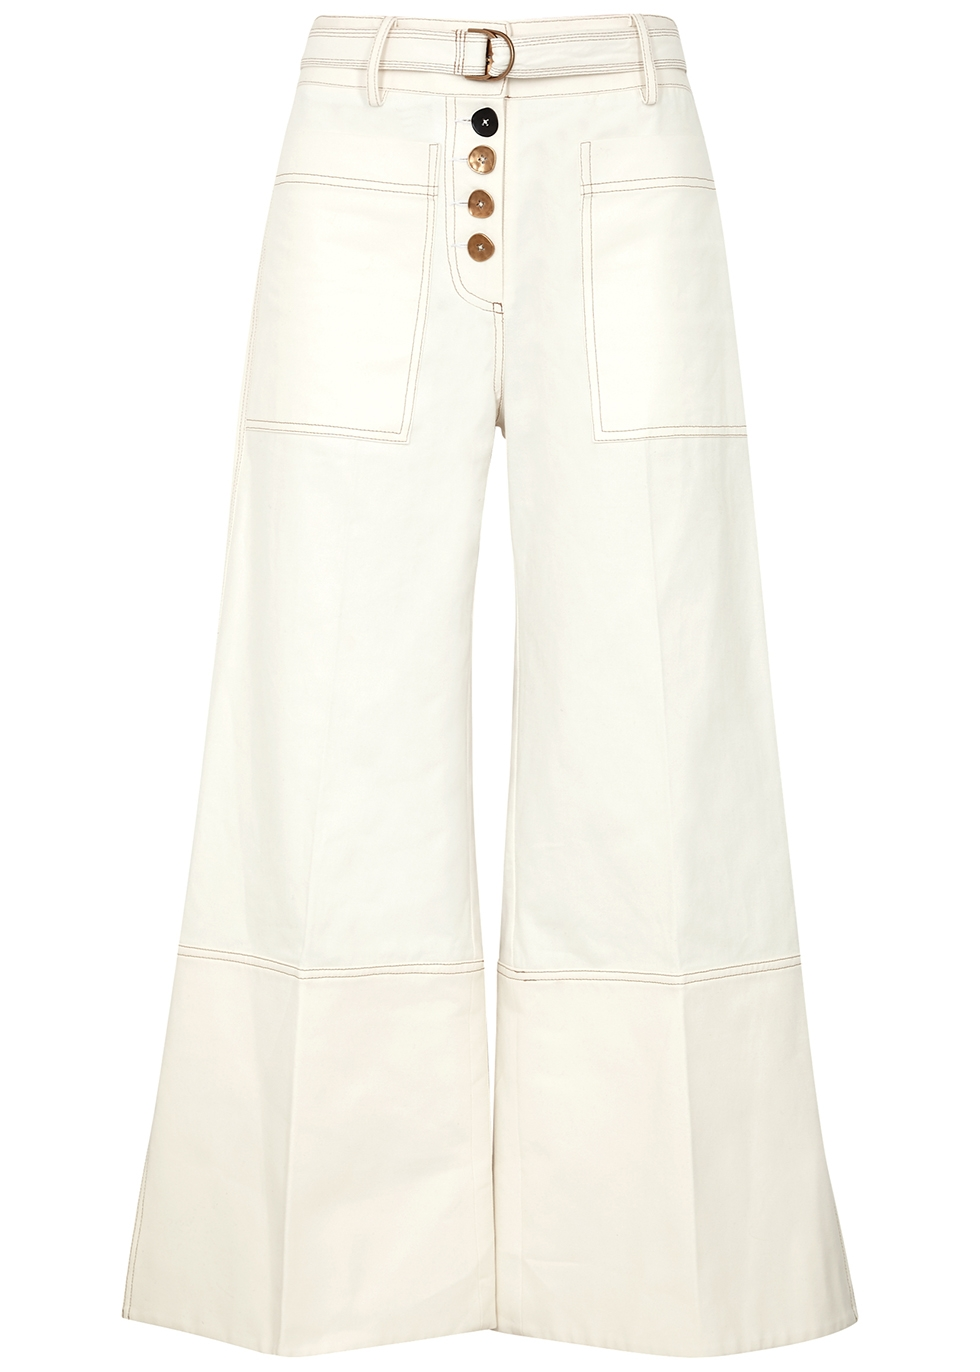 Sibelvis off-white wide-leg jeans